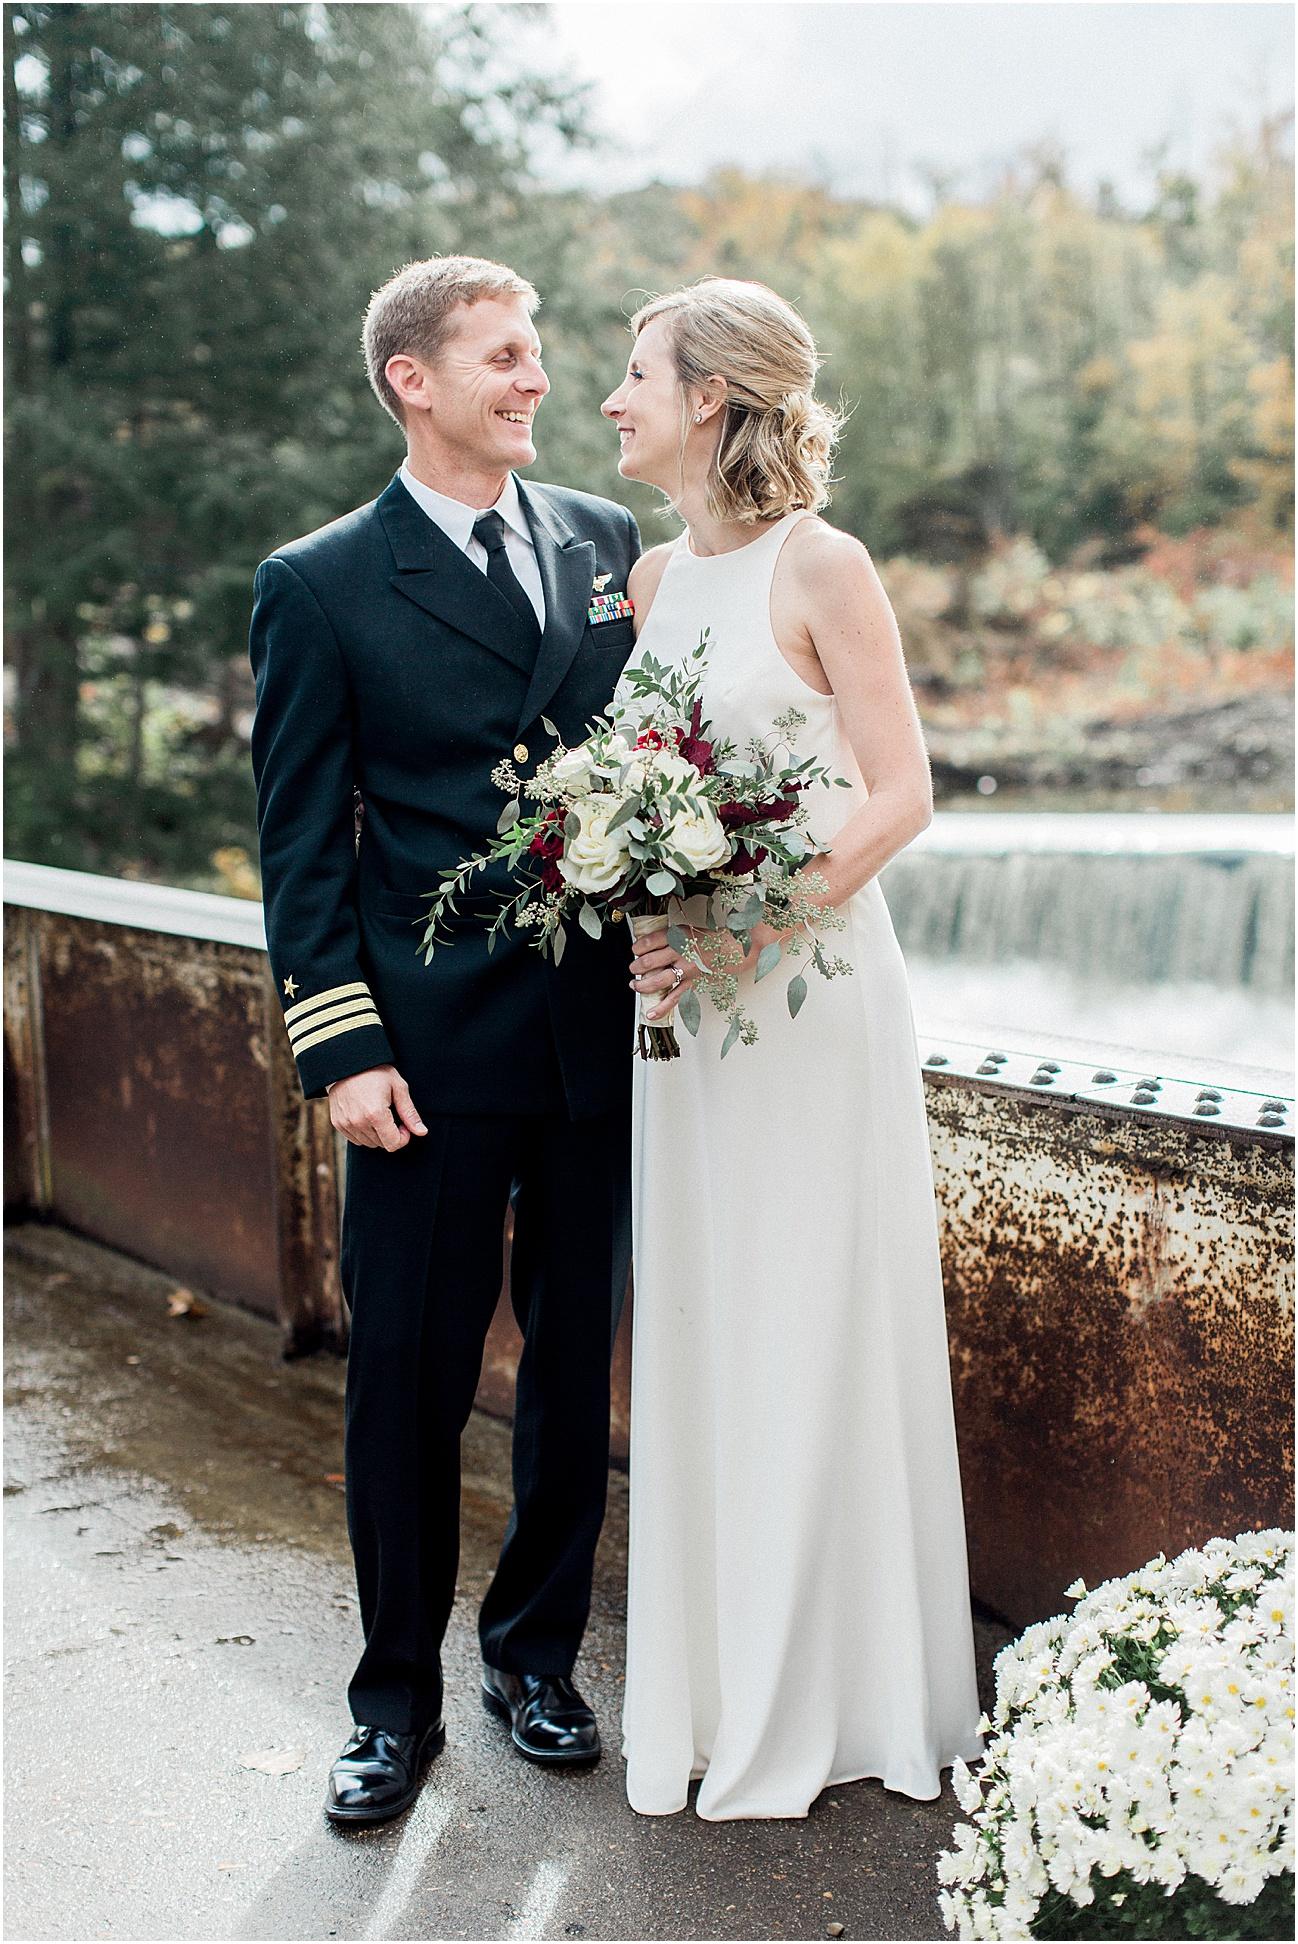 lauren_john_jon_ablany_browns_brewery_moses_farm_fall_cape_cod_boston_wedding_photographer_meredith_jane_photography_photo_1507.jpg